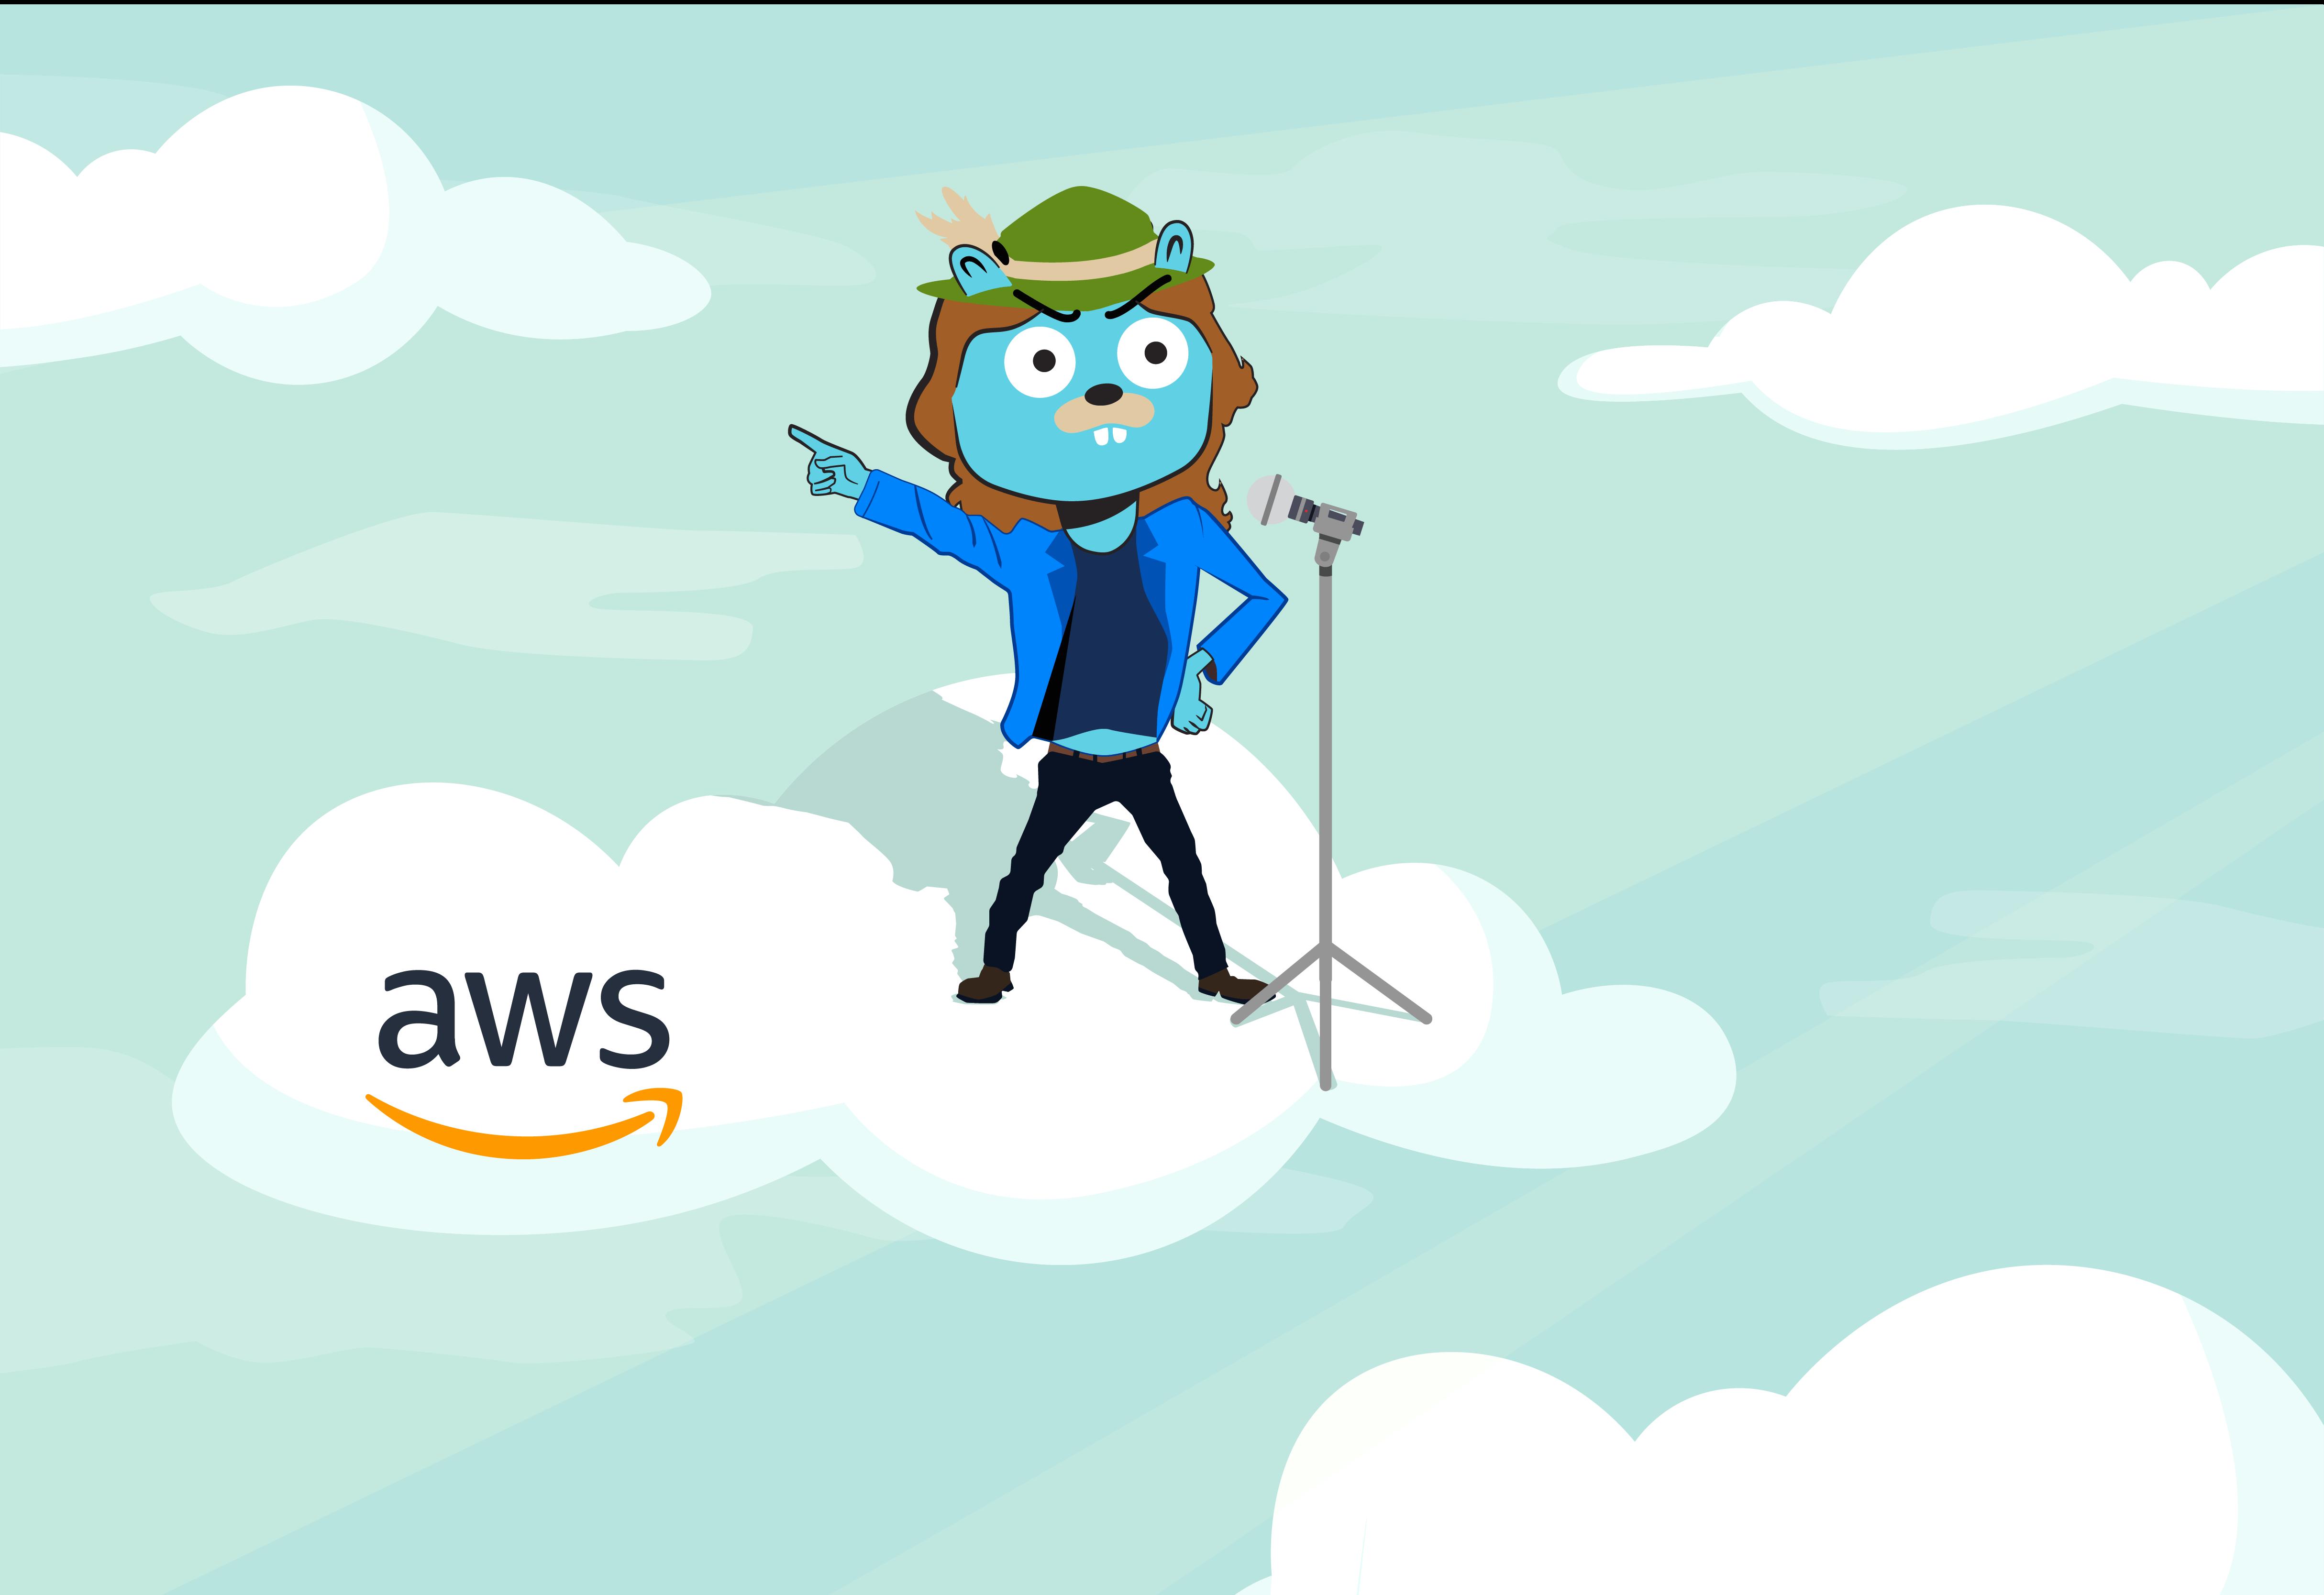 Jaeger logo dressed as Mick Jagger on an AWS cloud